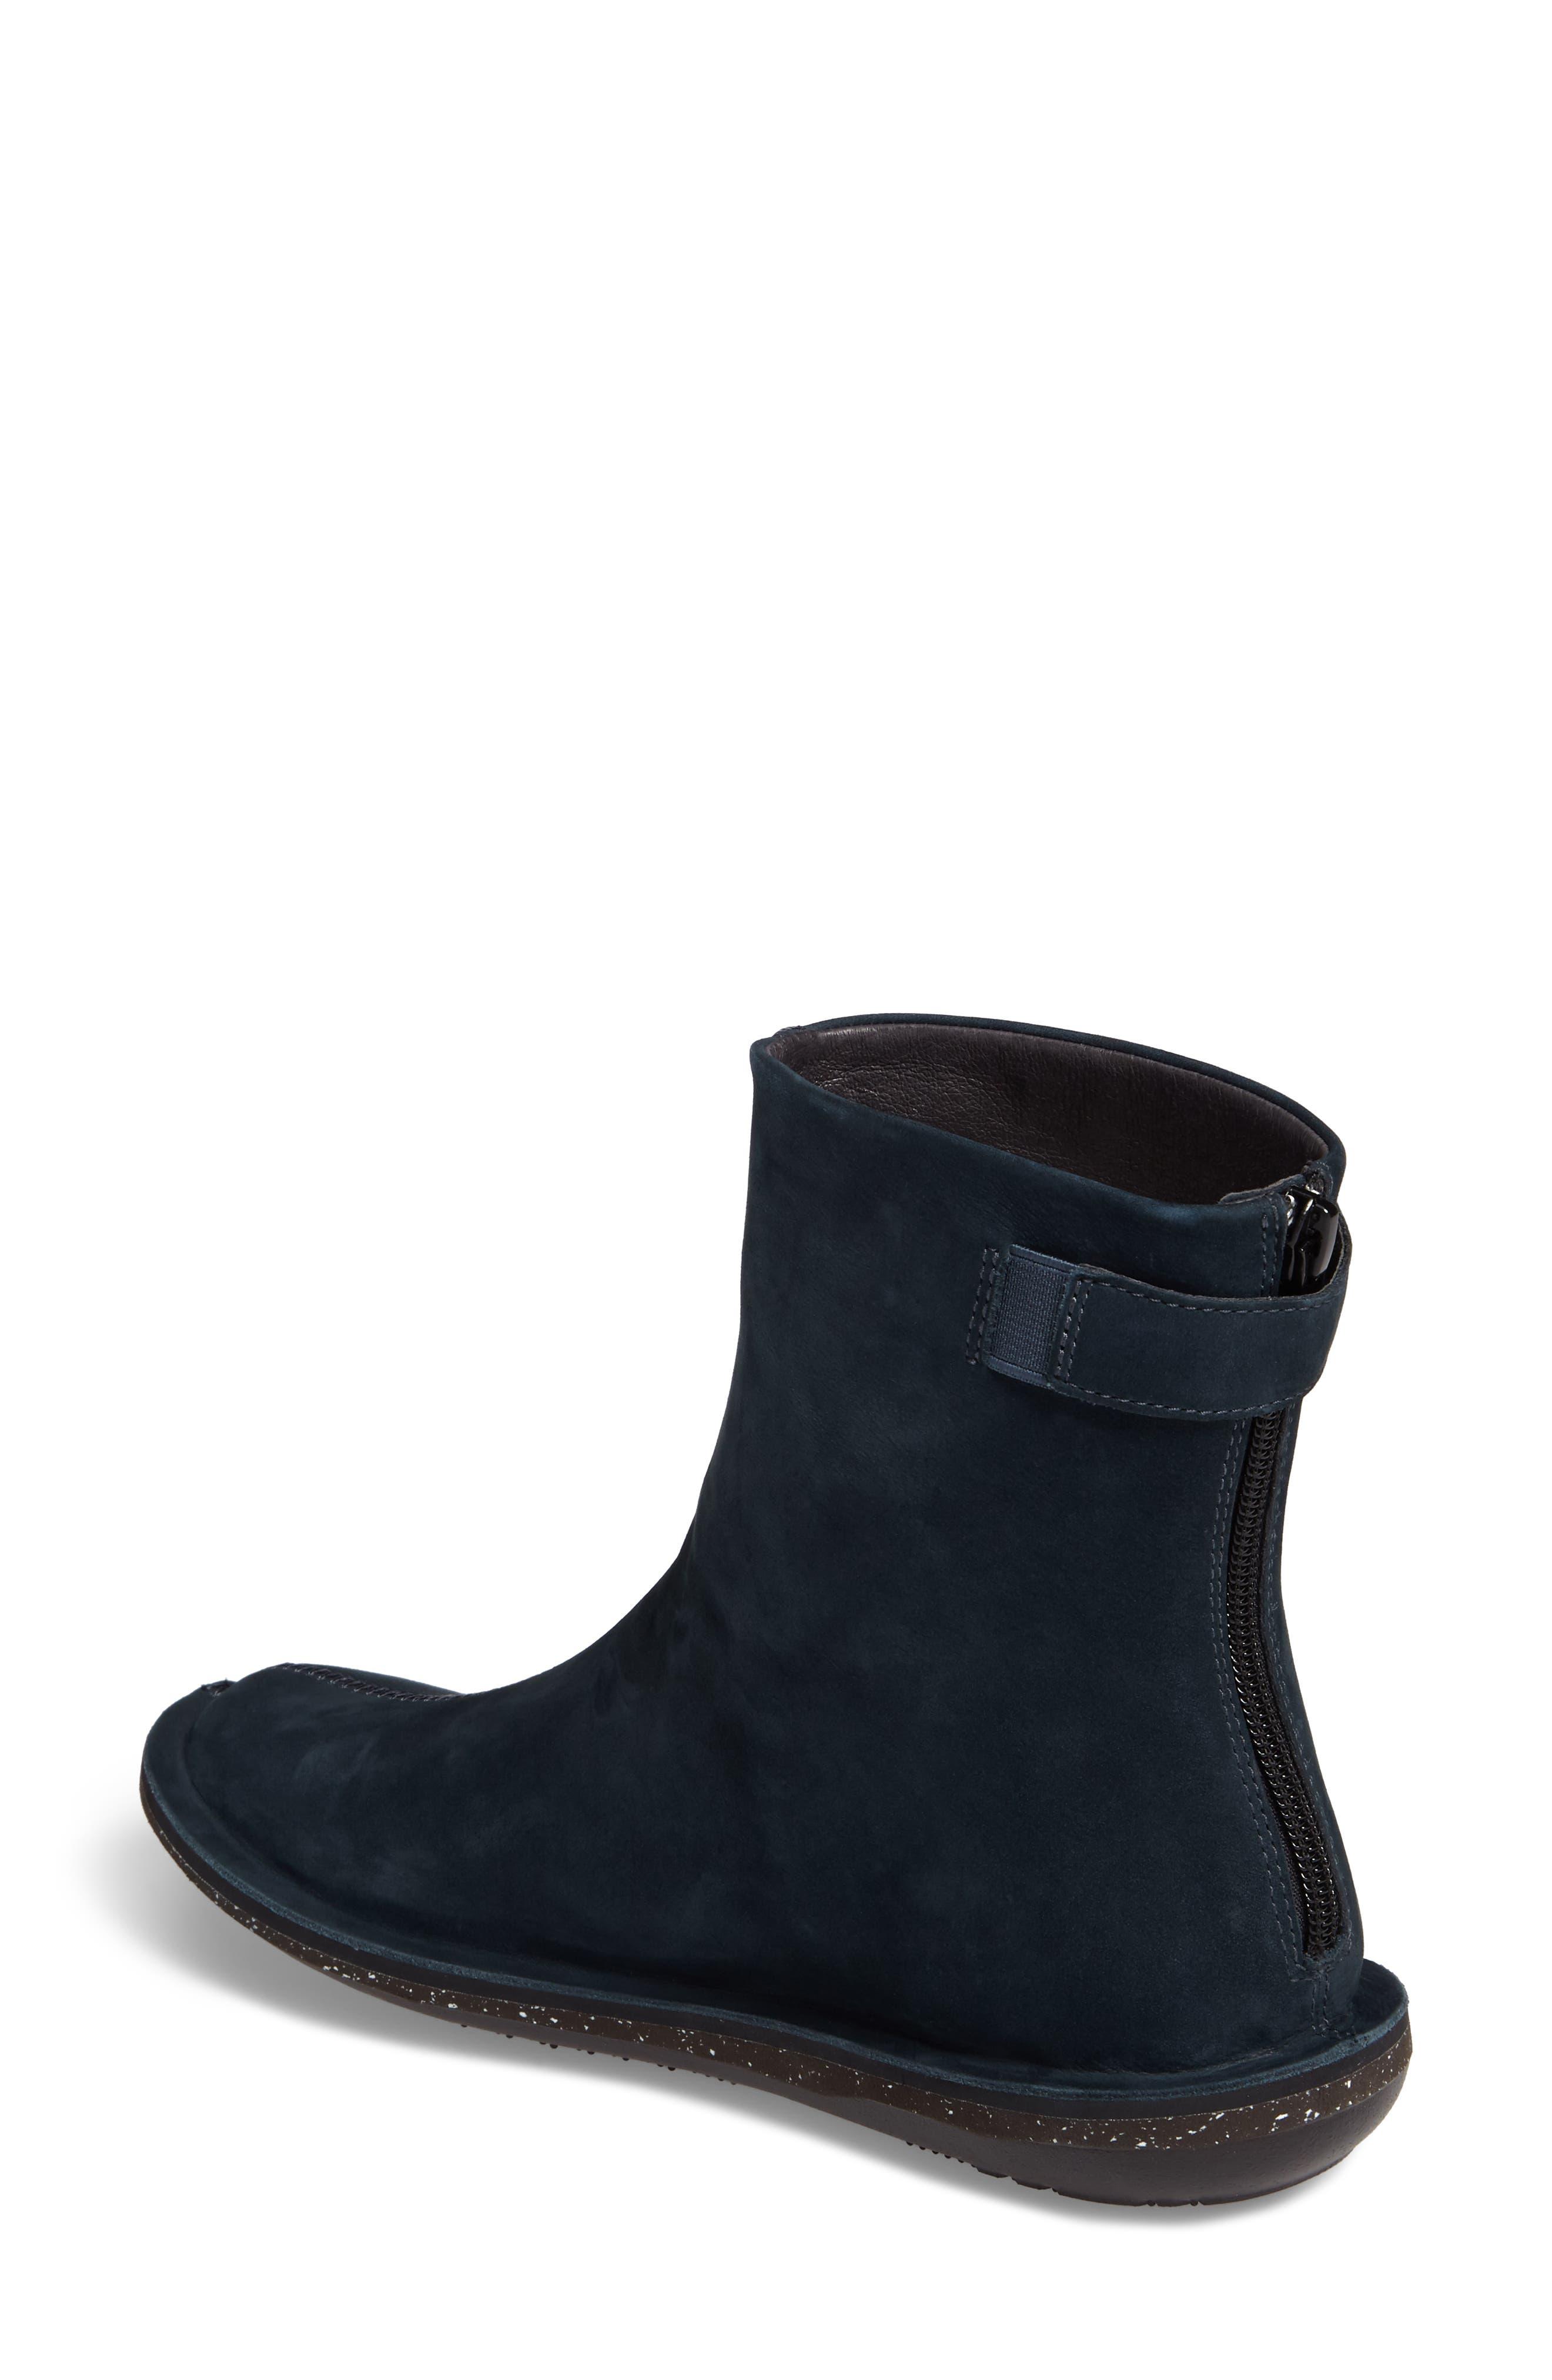 'Beetle Mid' Boot,                             Alternate thumbnail 2, color,                             Dark Blue Leather